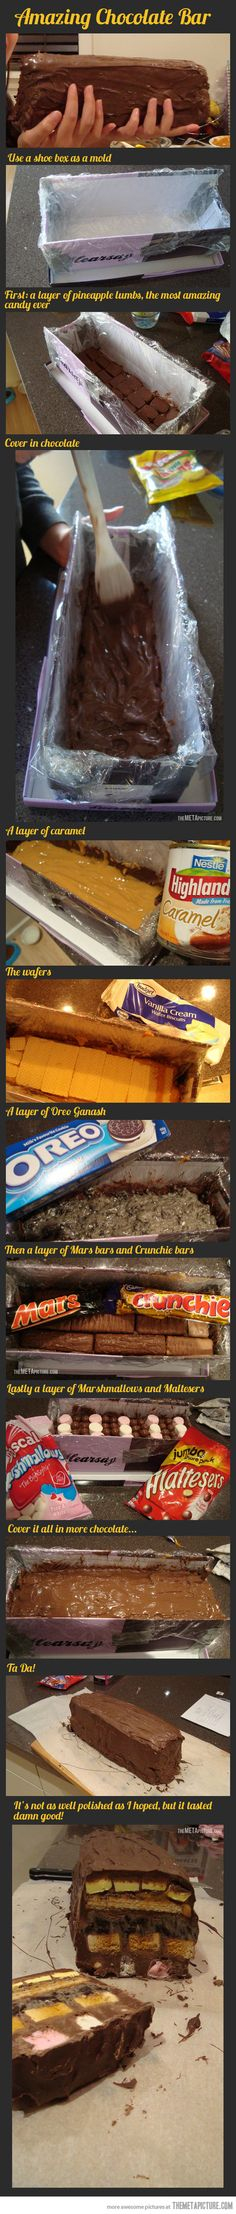 How to make an extraordinary chocolate bar